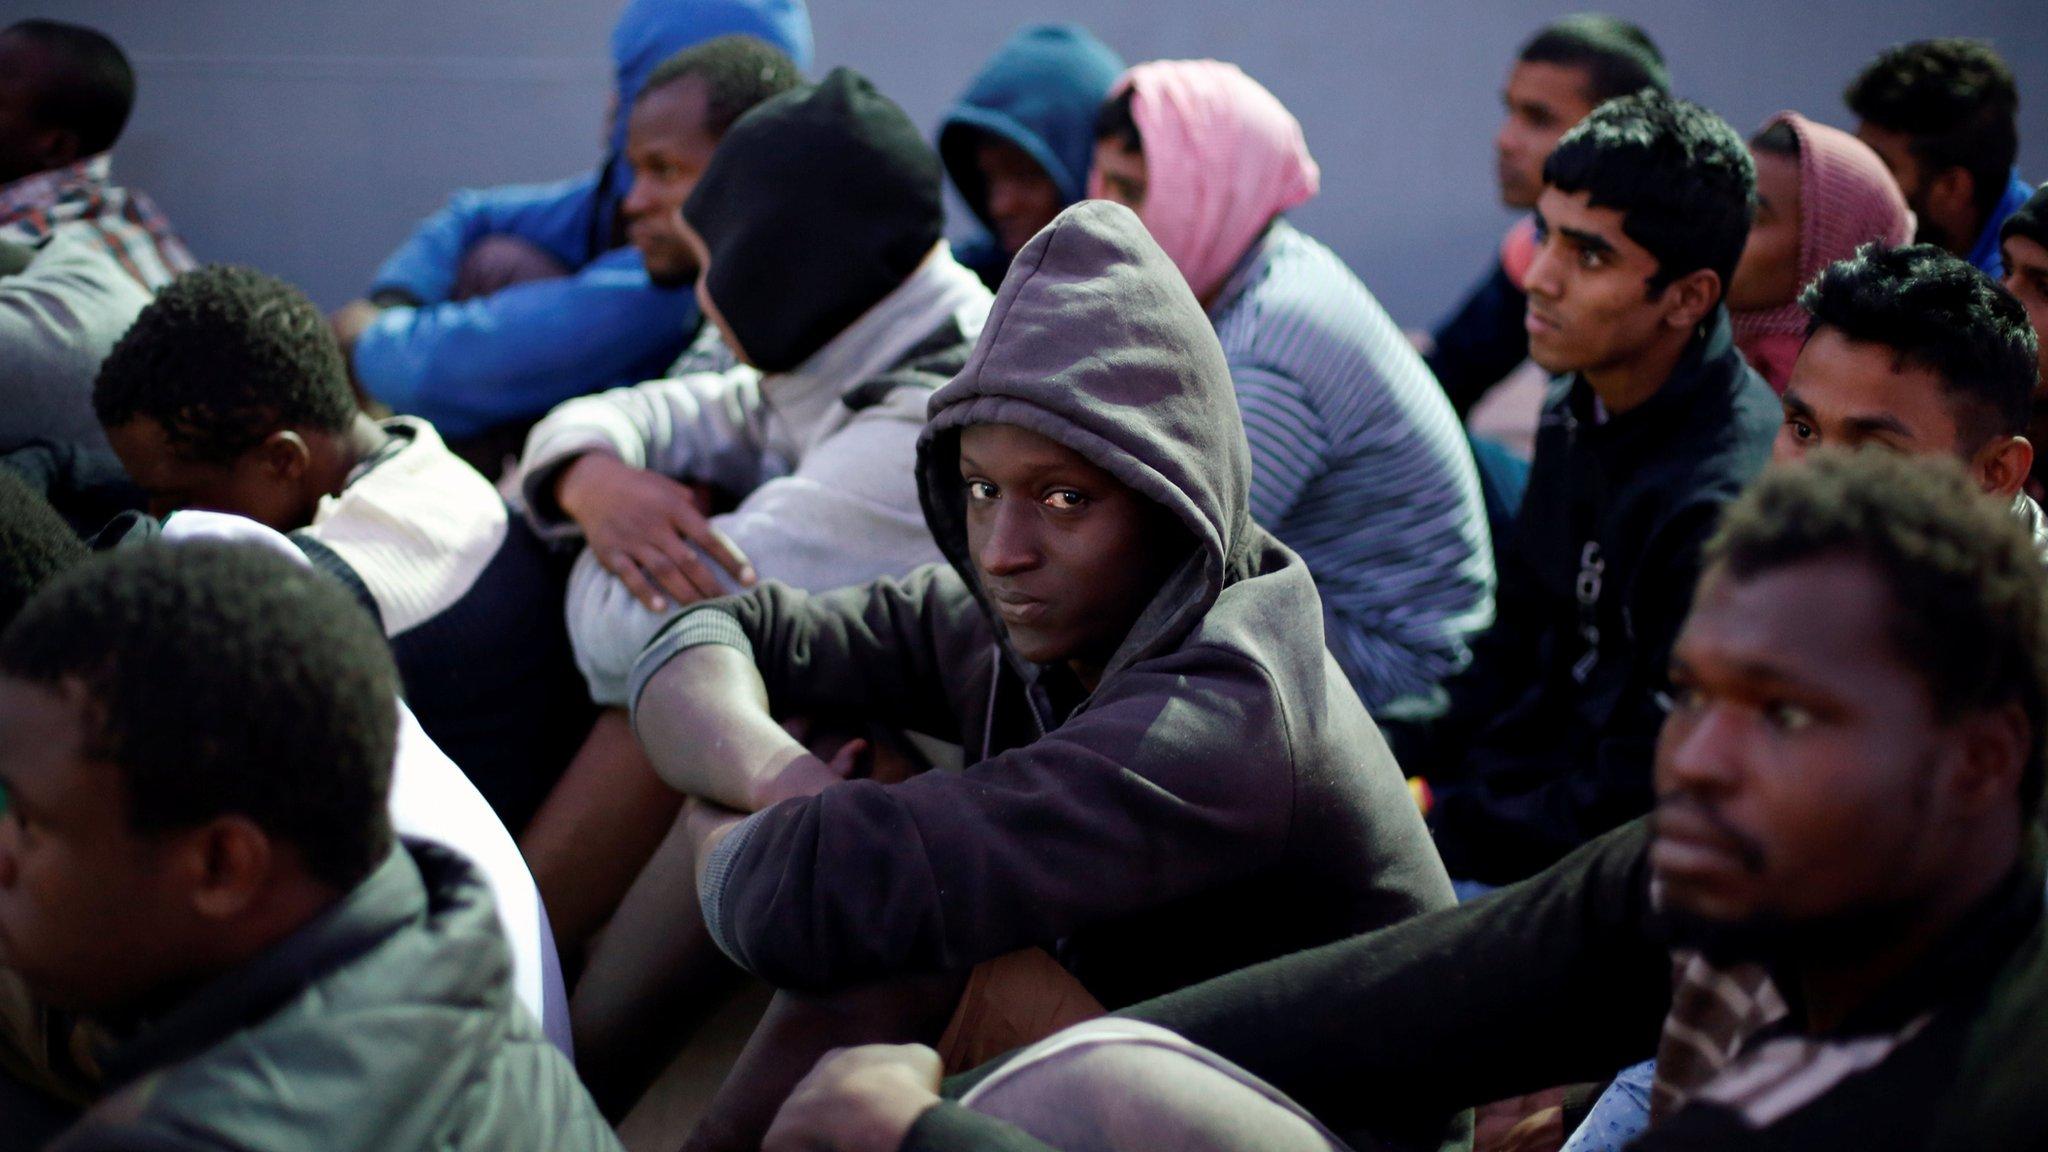 Libya migrants: Emergency evacuation operation agreed